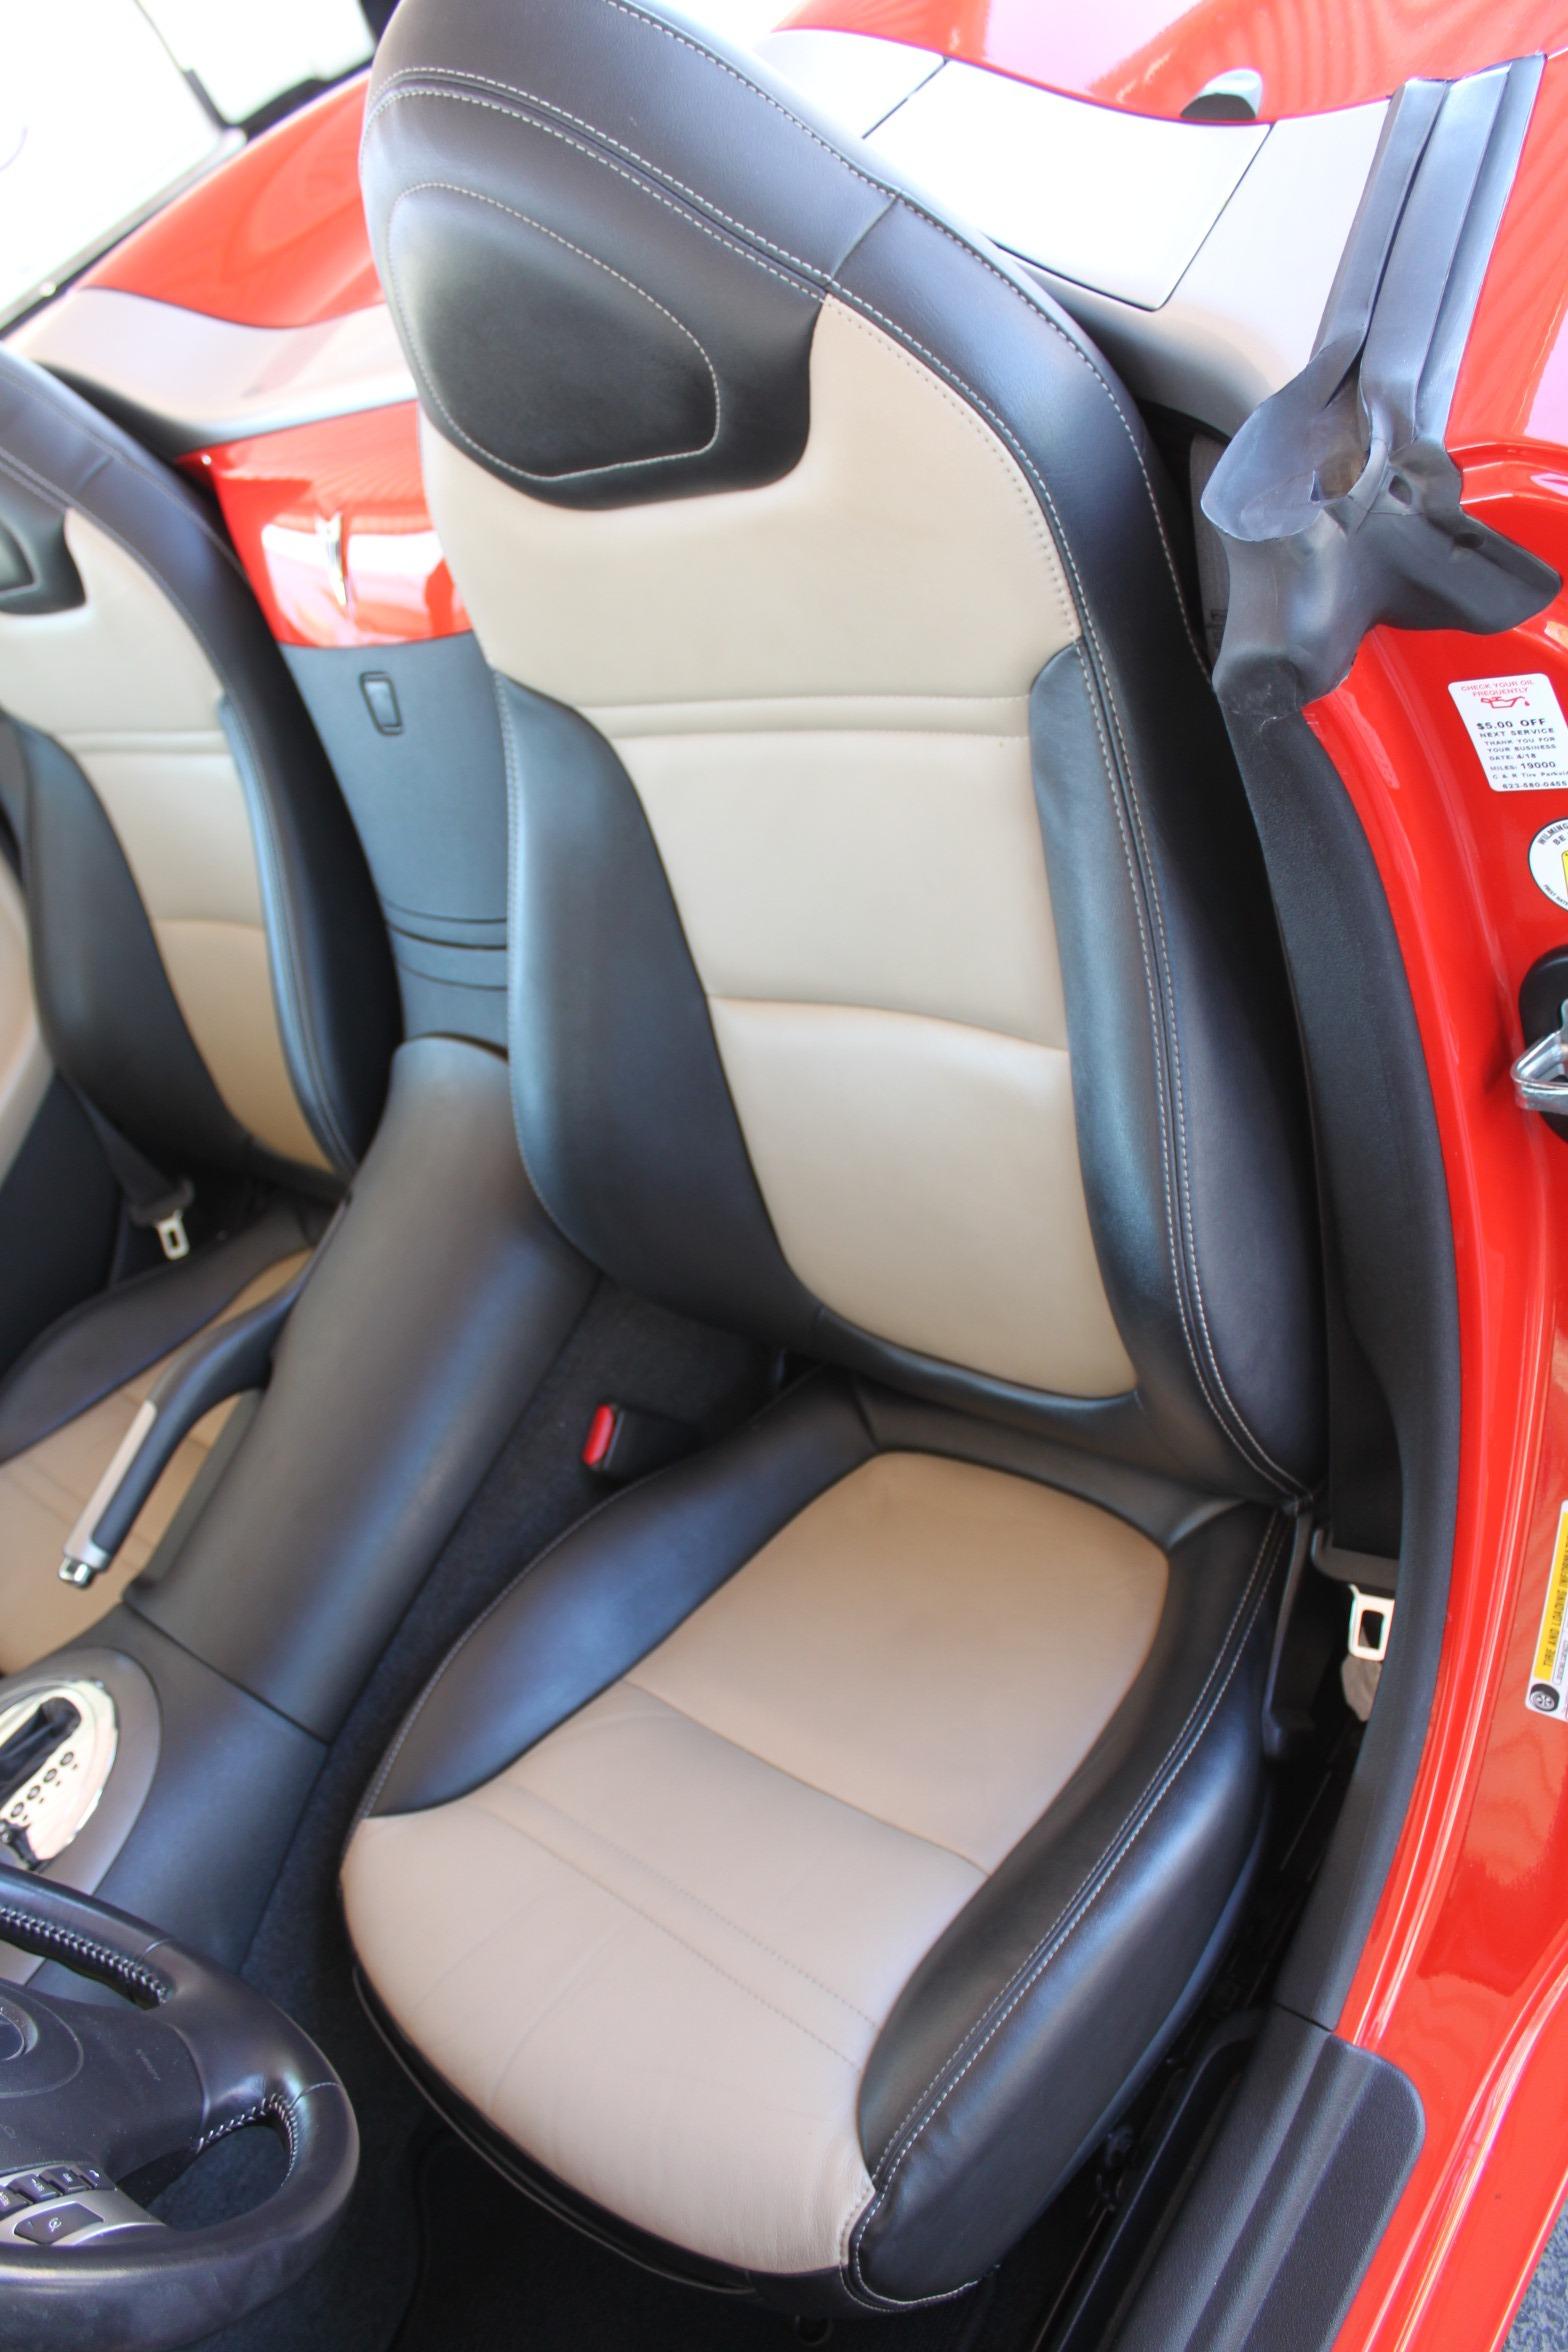 Used-2008-Pontiac-Solstice-Chrysler